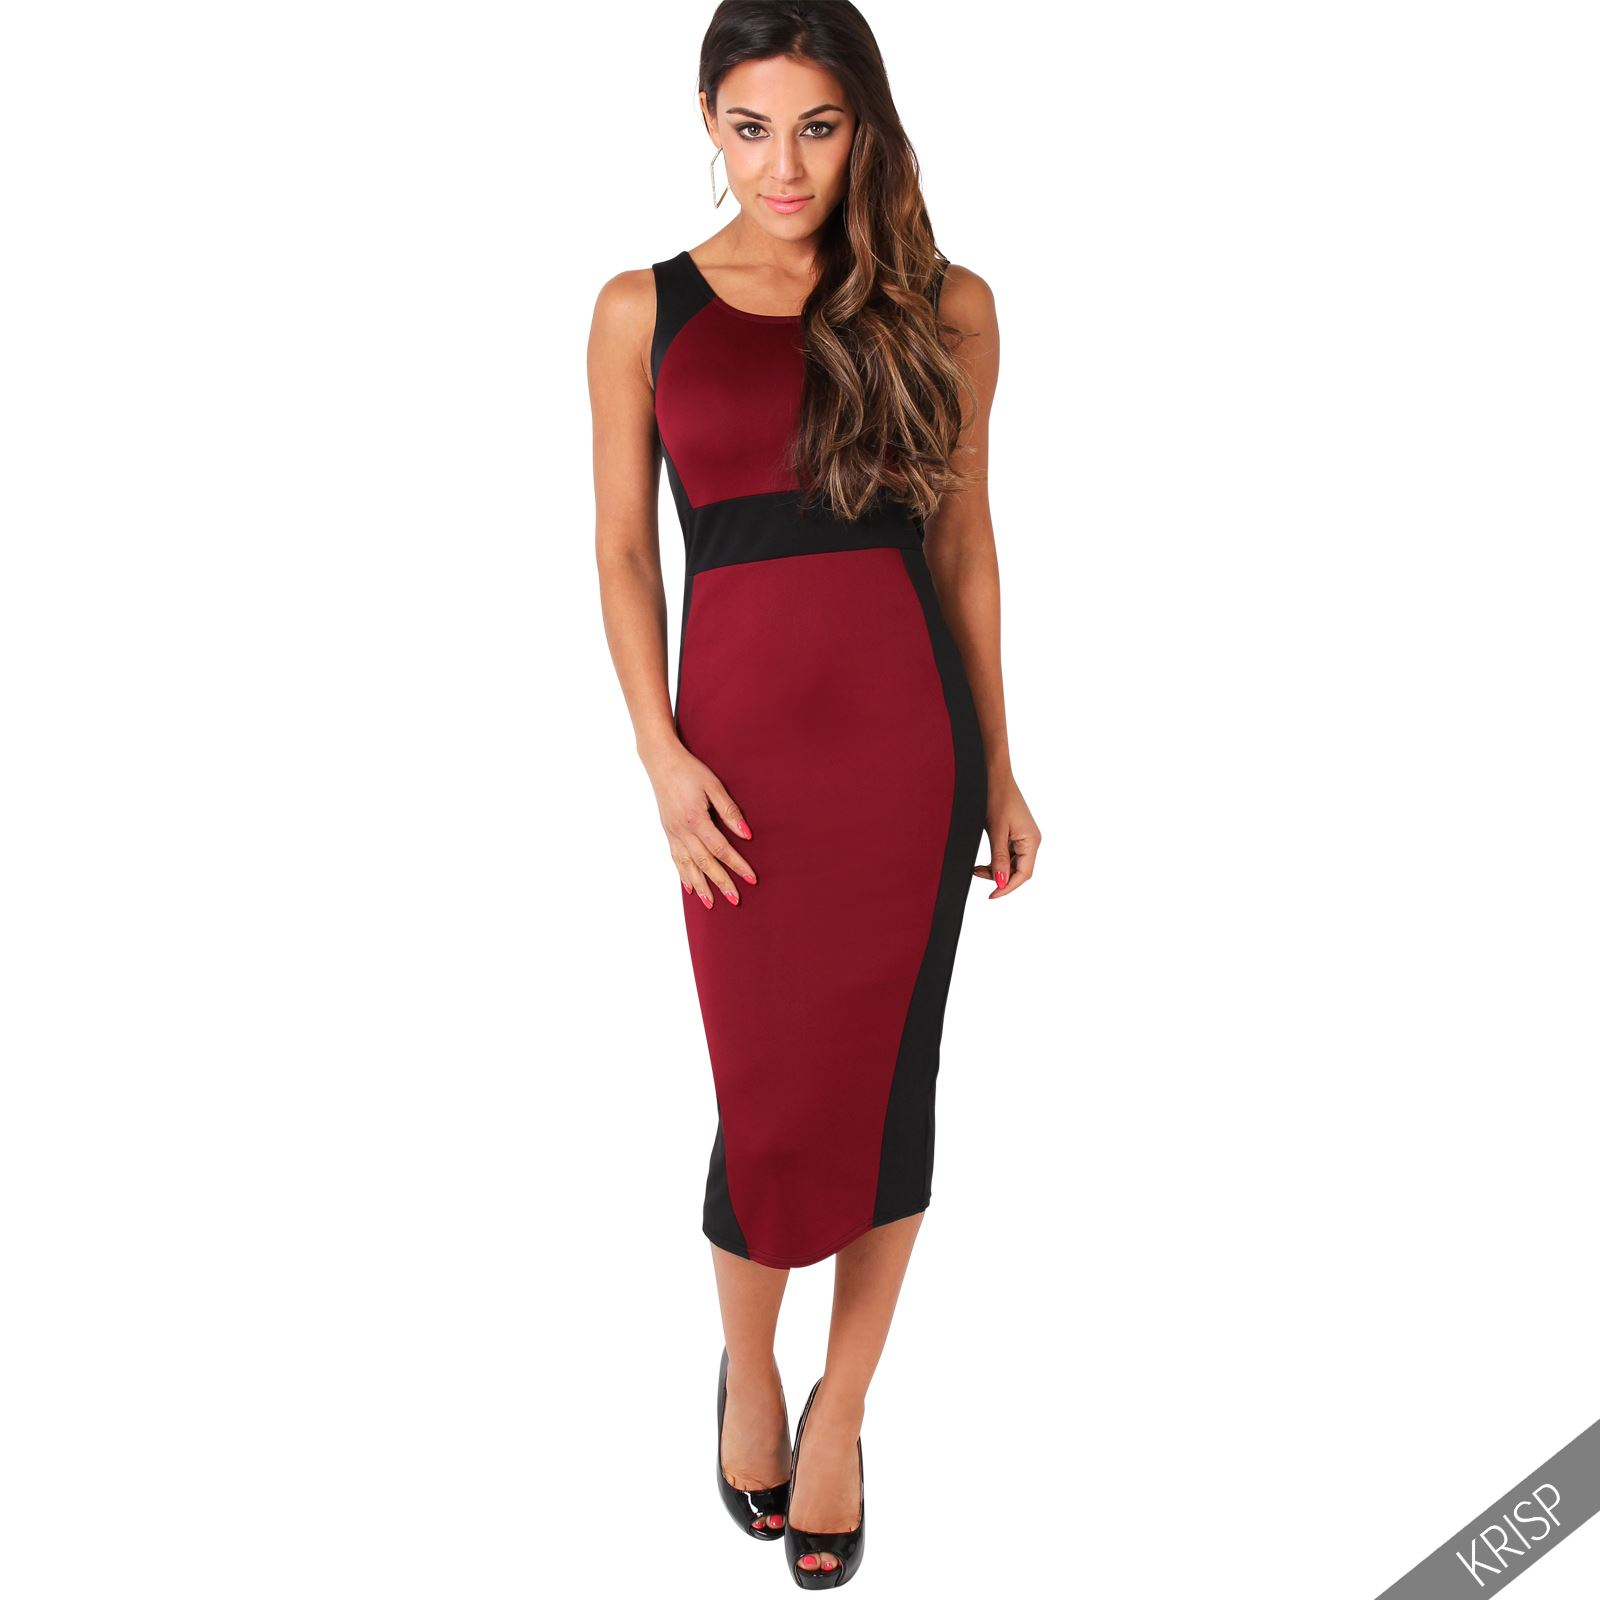 damen stretch kleid kontrastfarben knielang hohe taille cocktailkleid etuikleid ebay